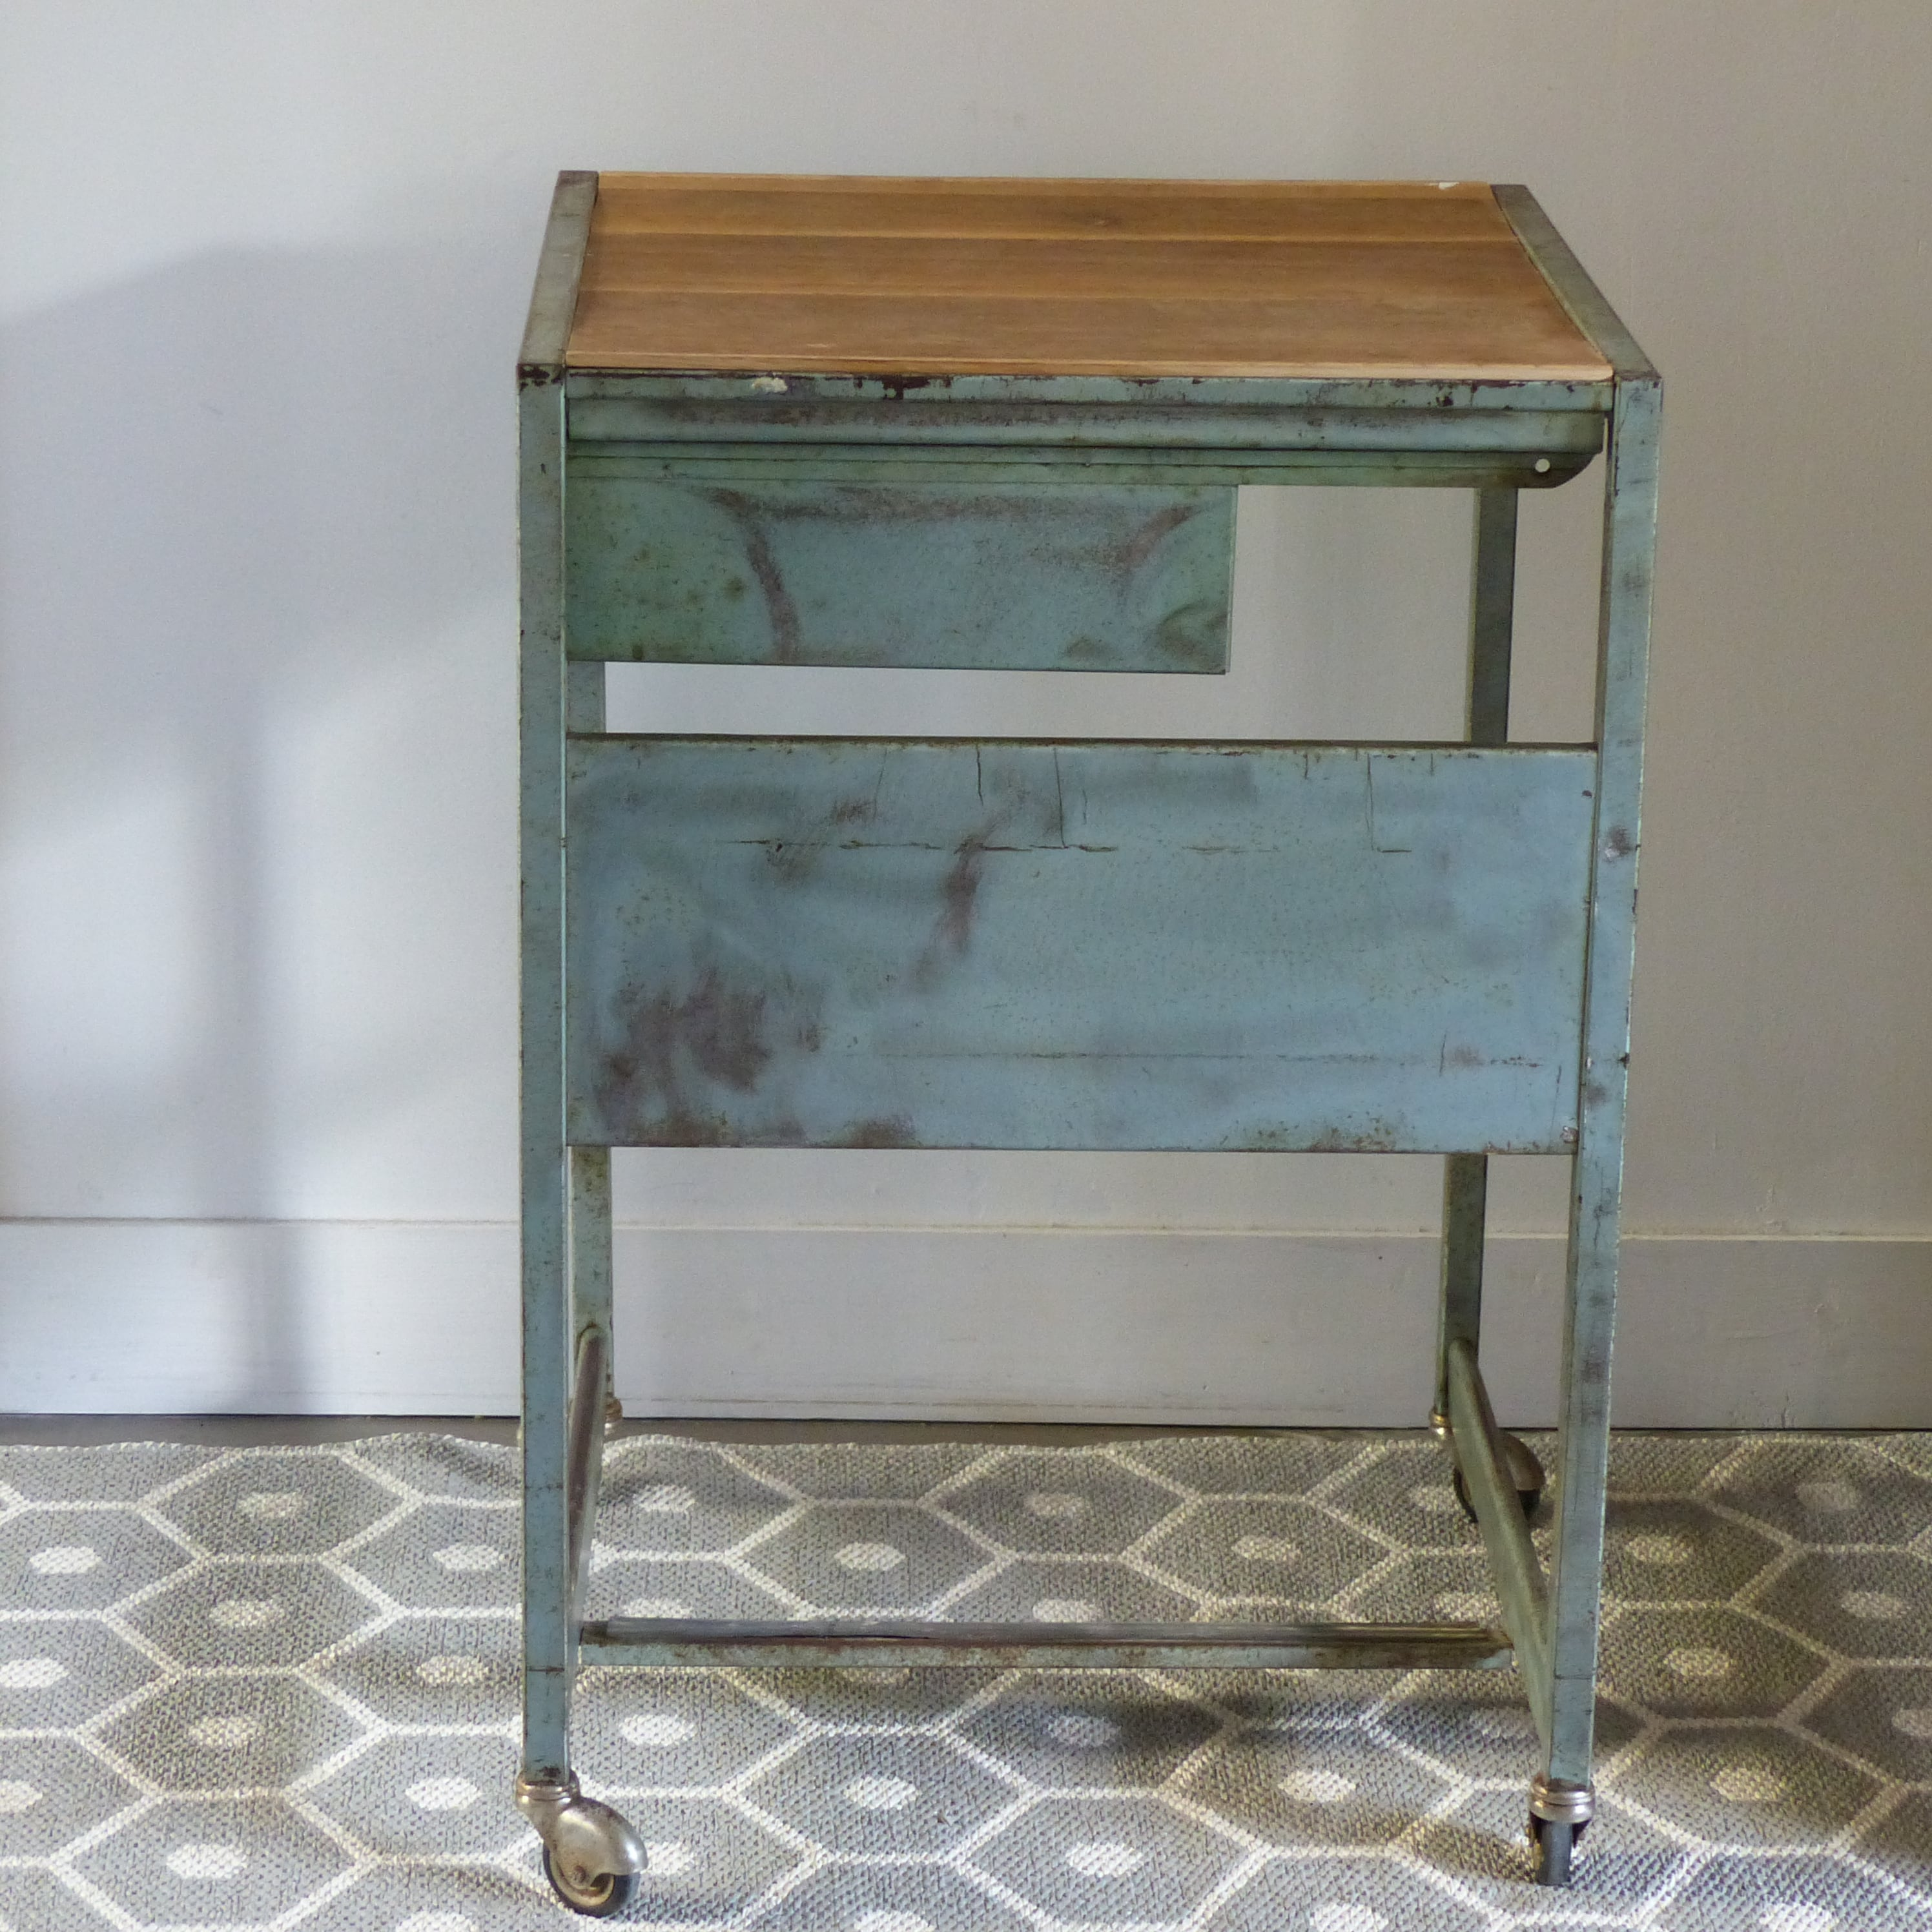 desserte industrielle sur roulettes avec tiroir escamotable lignedebrocante brocante en ligne. Black Bedroom Furniture Sets. Home Design Ideas